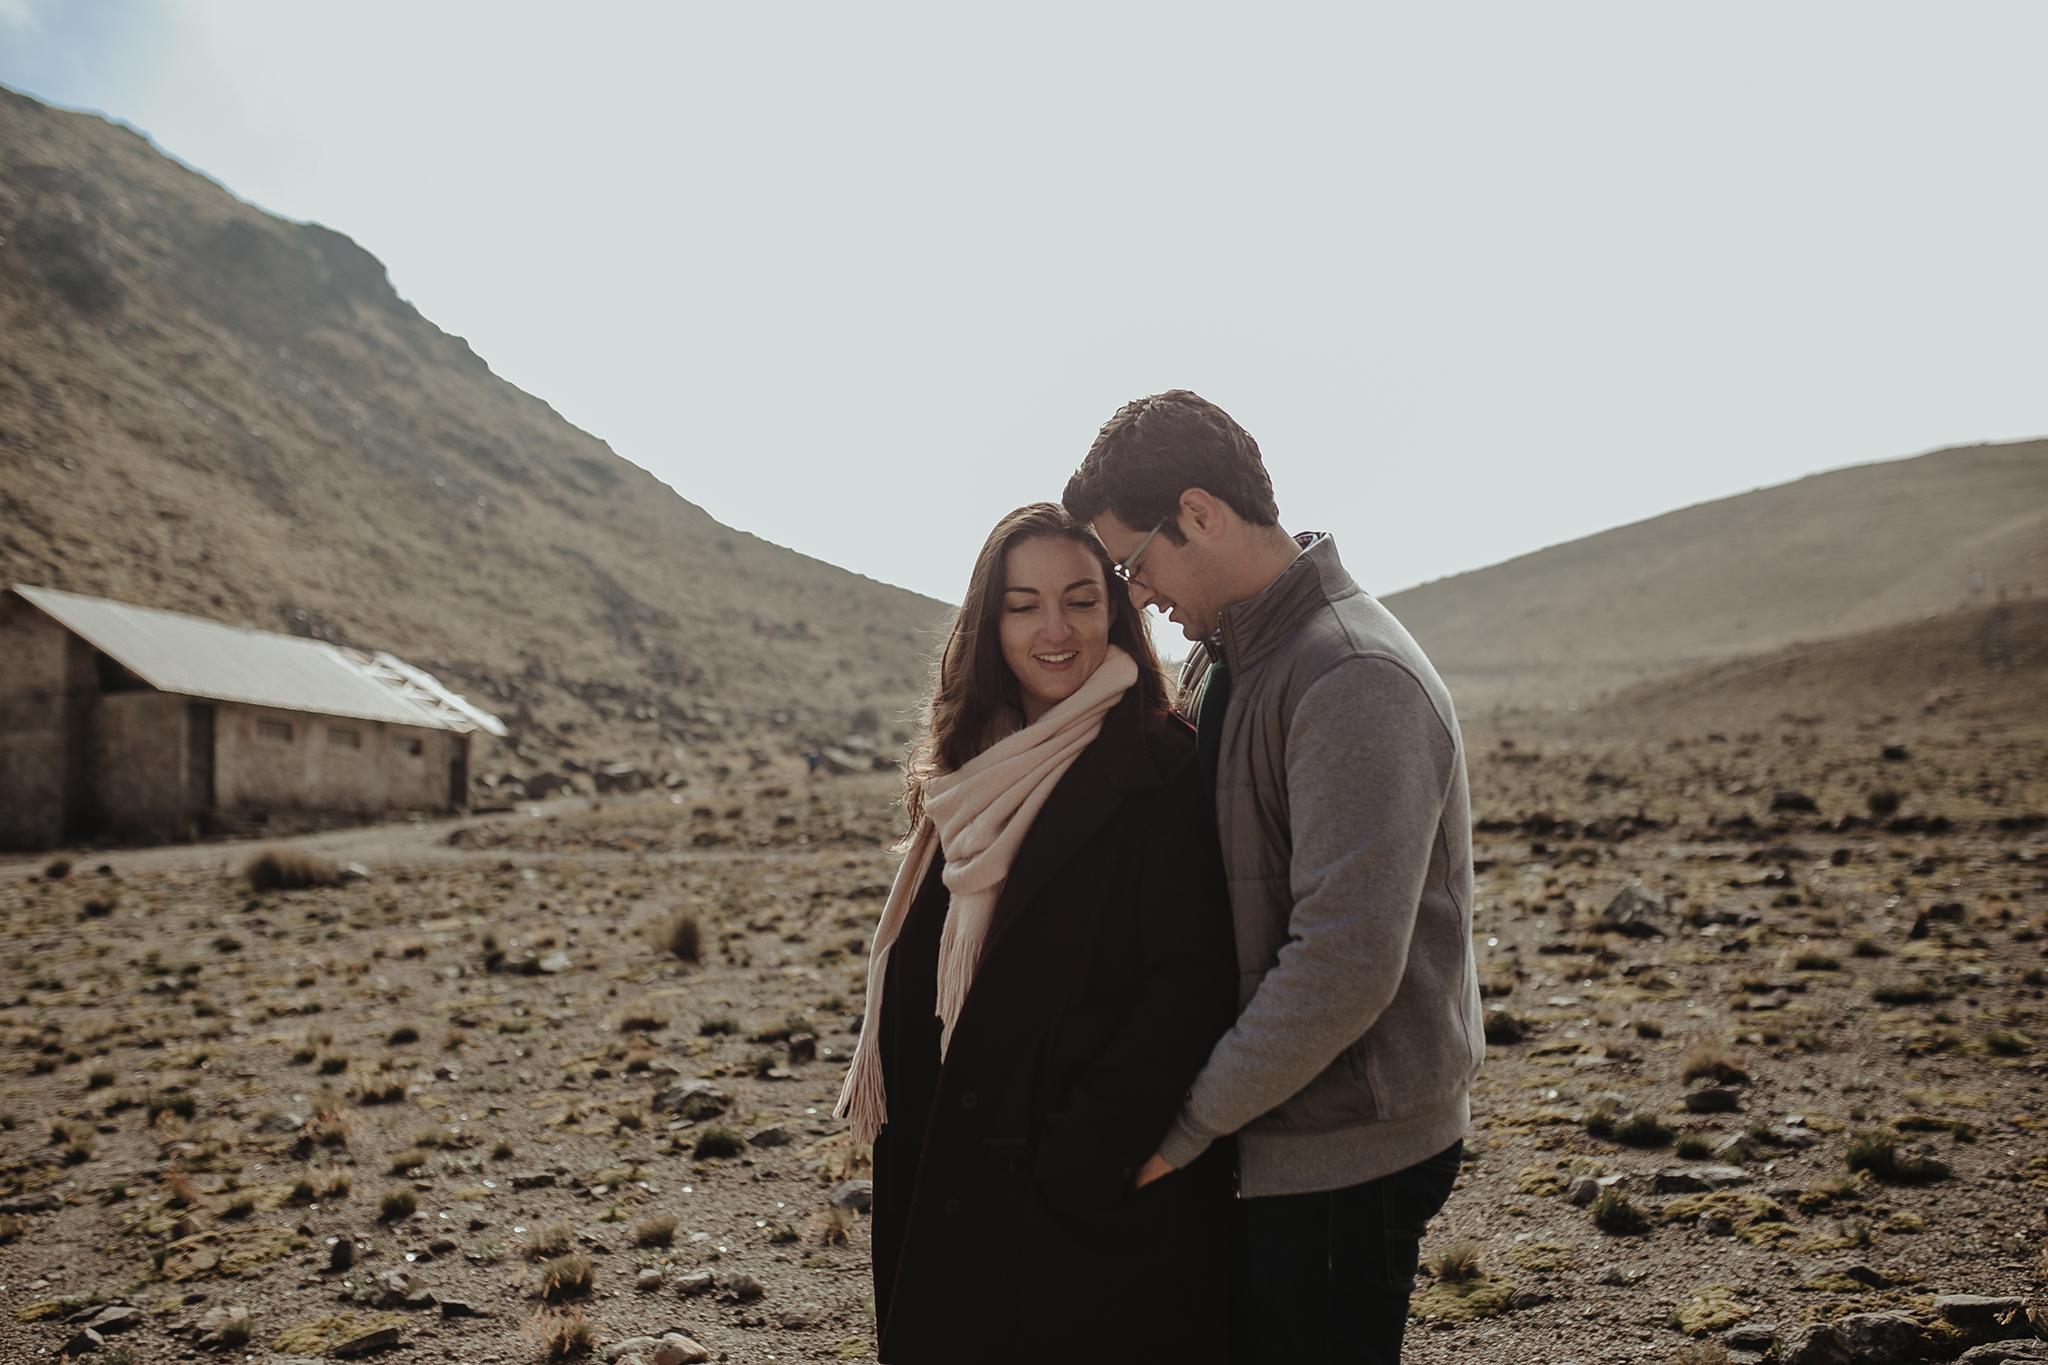 0292L&R_nevado_engagement_WeddingPhotography_Wedding_Boda_WeddingDestination_BodasYucatan.jpg